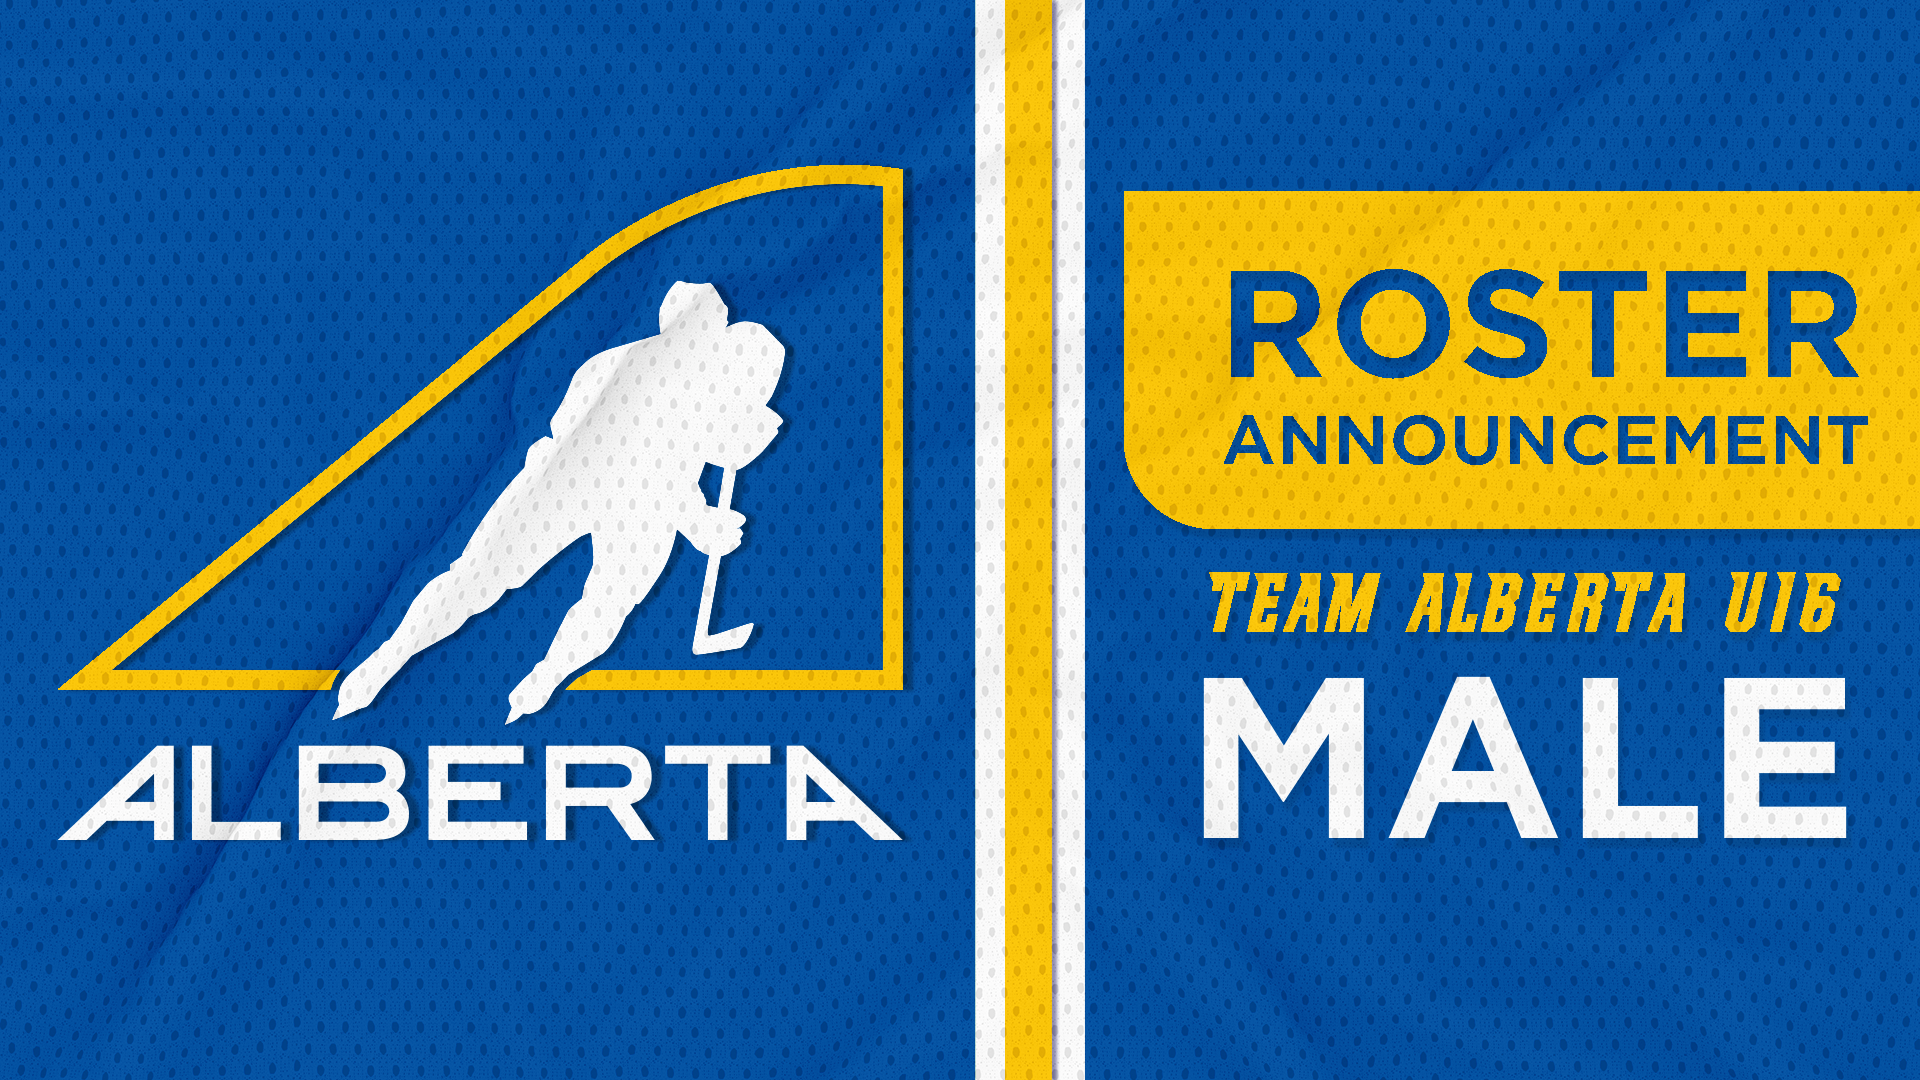 Hockey-Alberta-ROSTER-ANNOUNCEMENT-Steve-Mack-2019.png